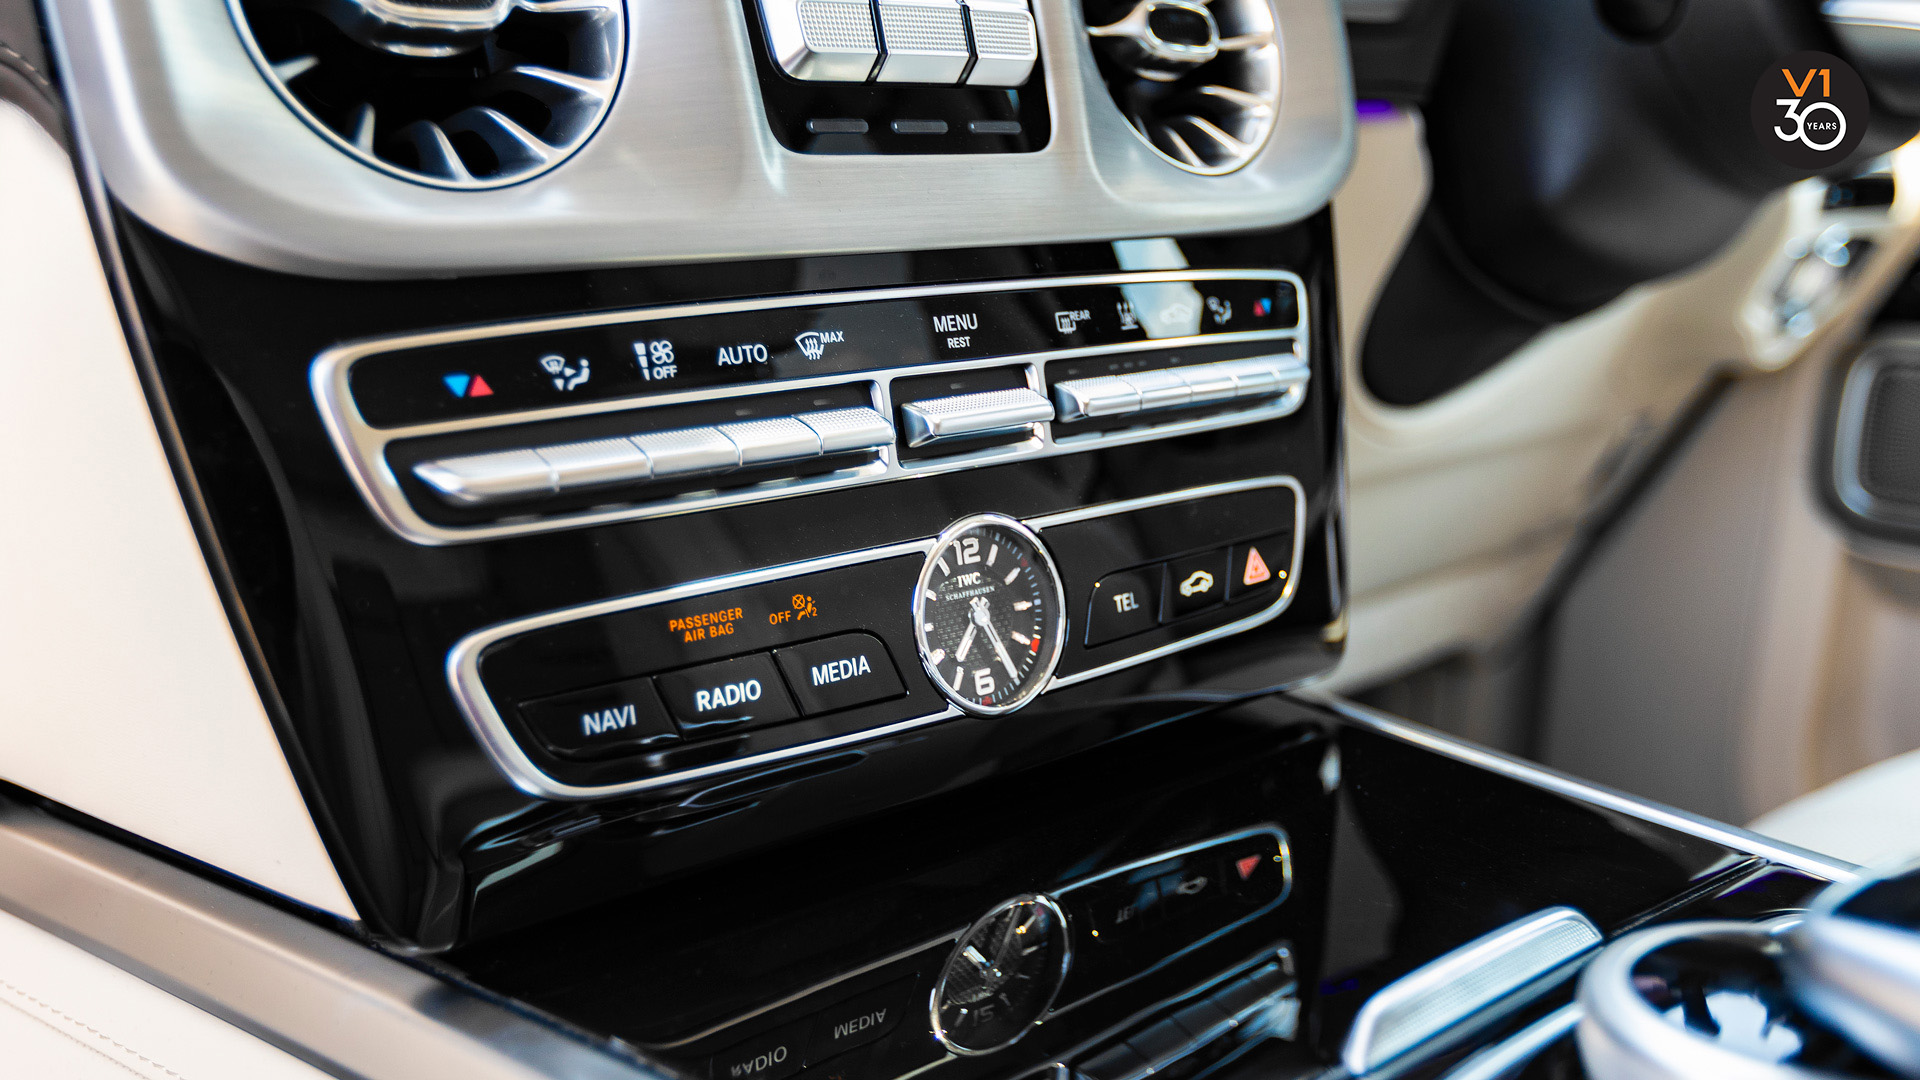 Mercedes G63 AMG - Multimedia System